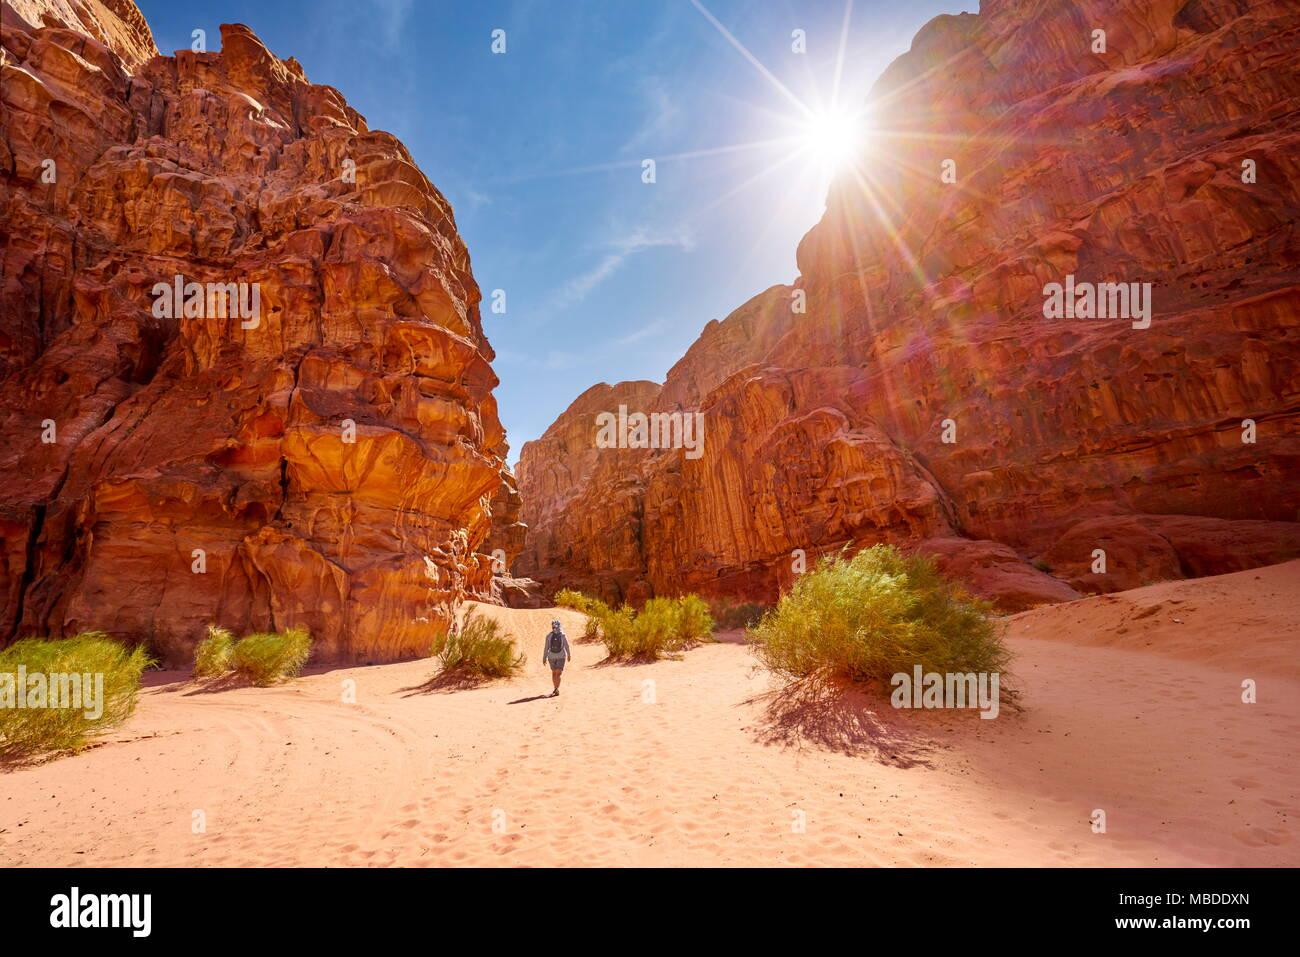 Trekking dans le désert de Wadi Rum, Jordanie Photo Stock